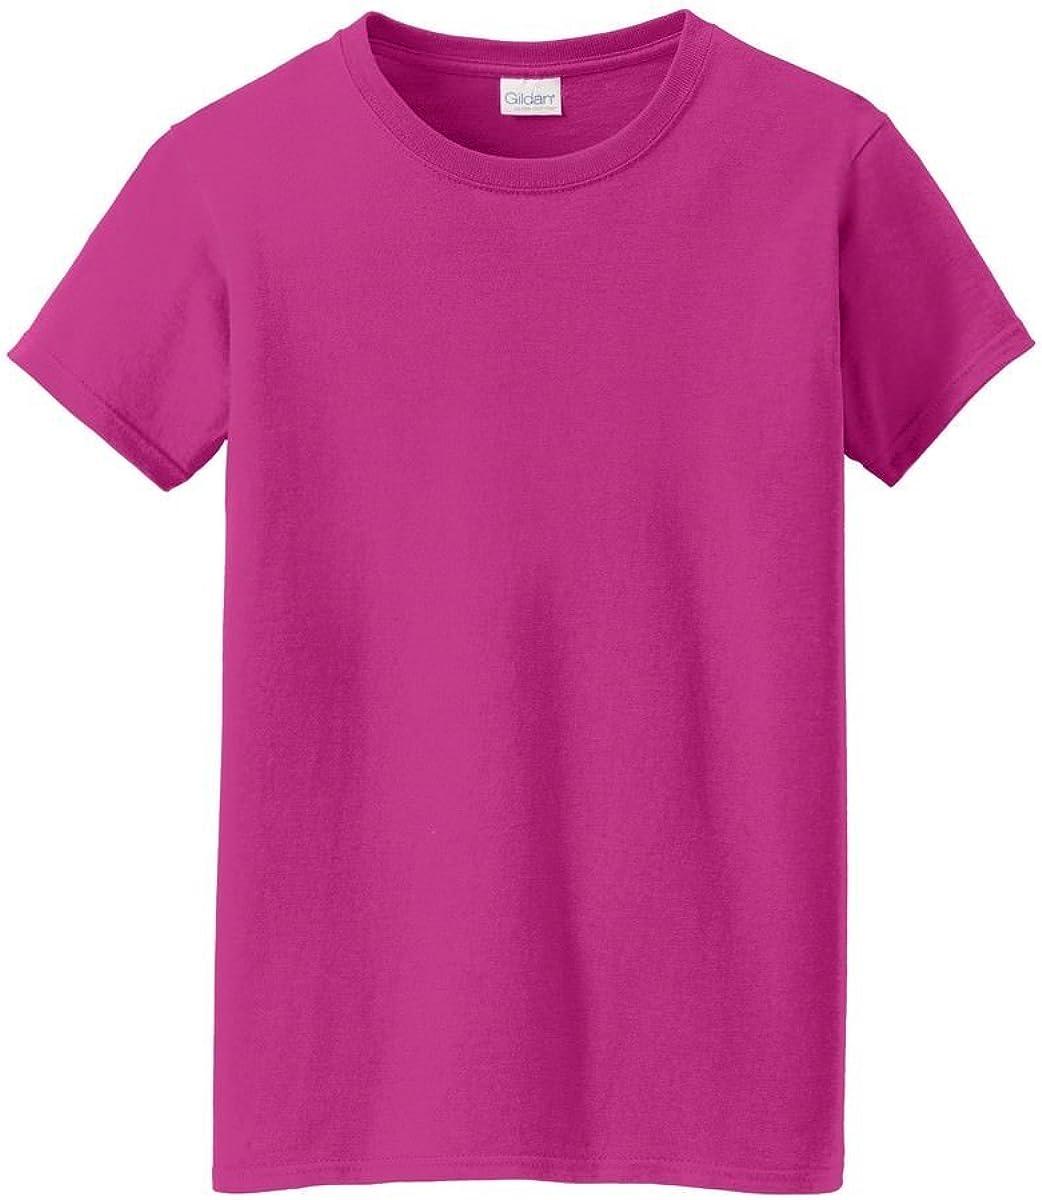 Top 10 Gildan Dryblend Tee Shirts Olive Garden